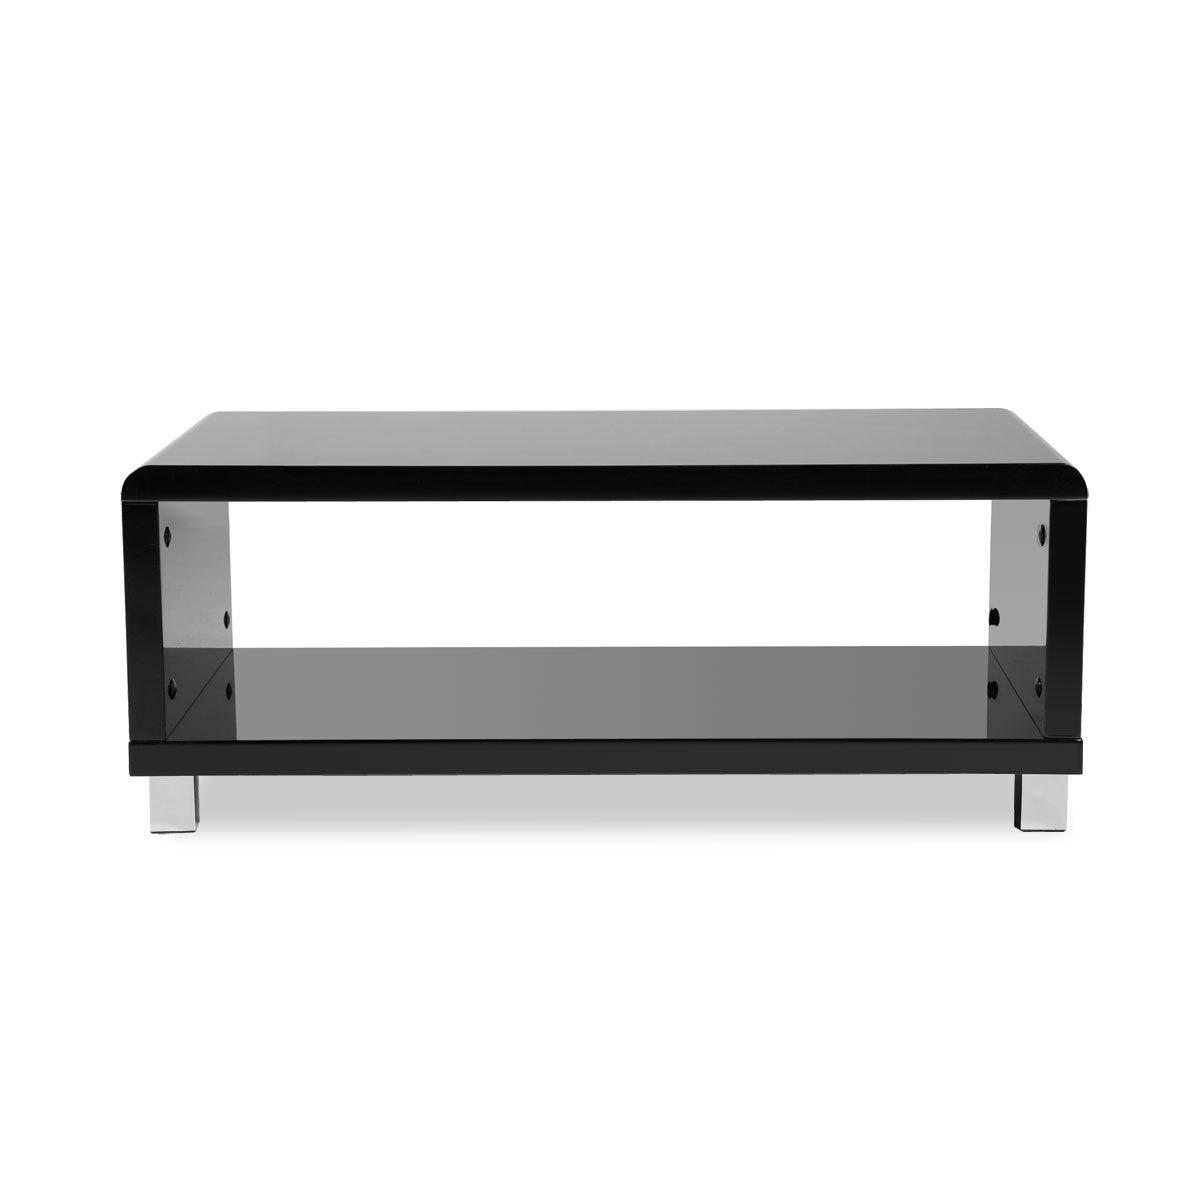 Miliboo Table basse design laquée noire ROXY